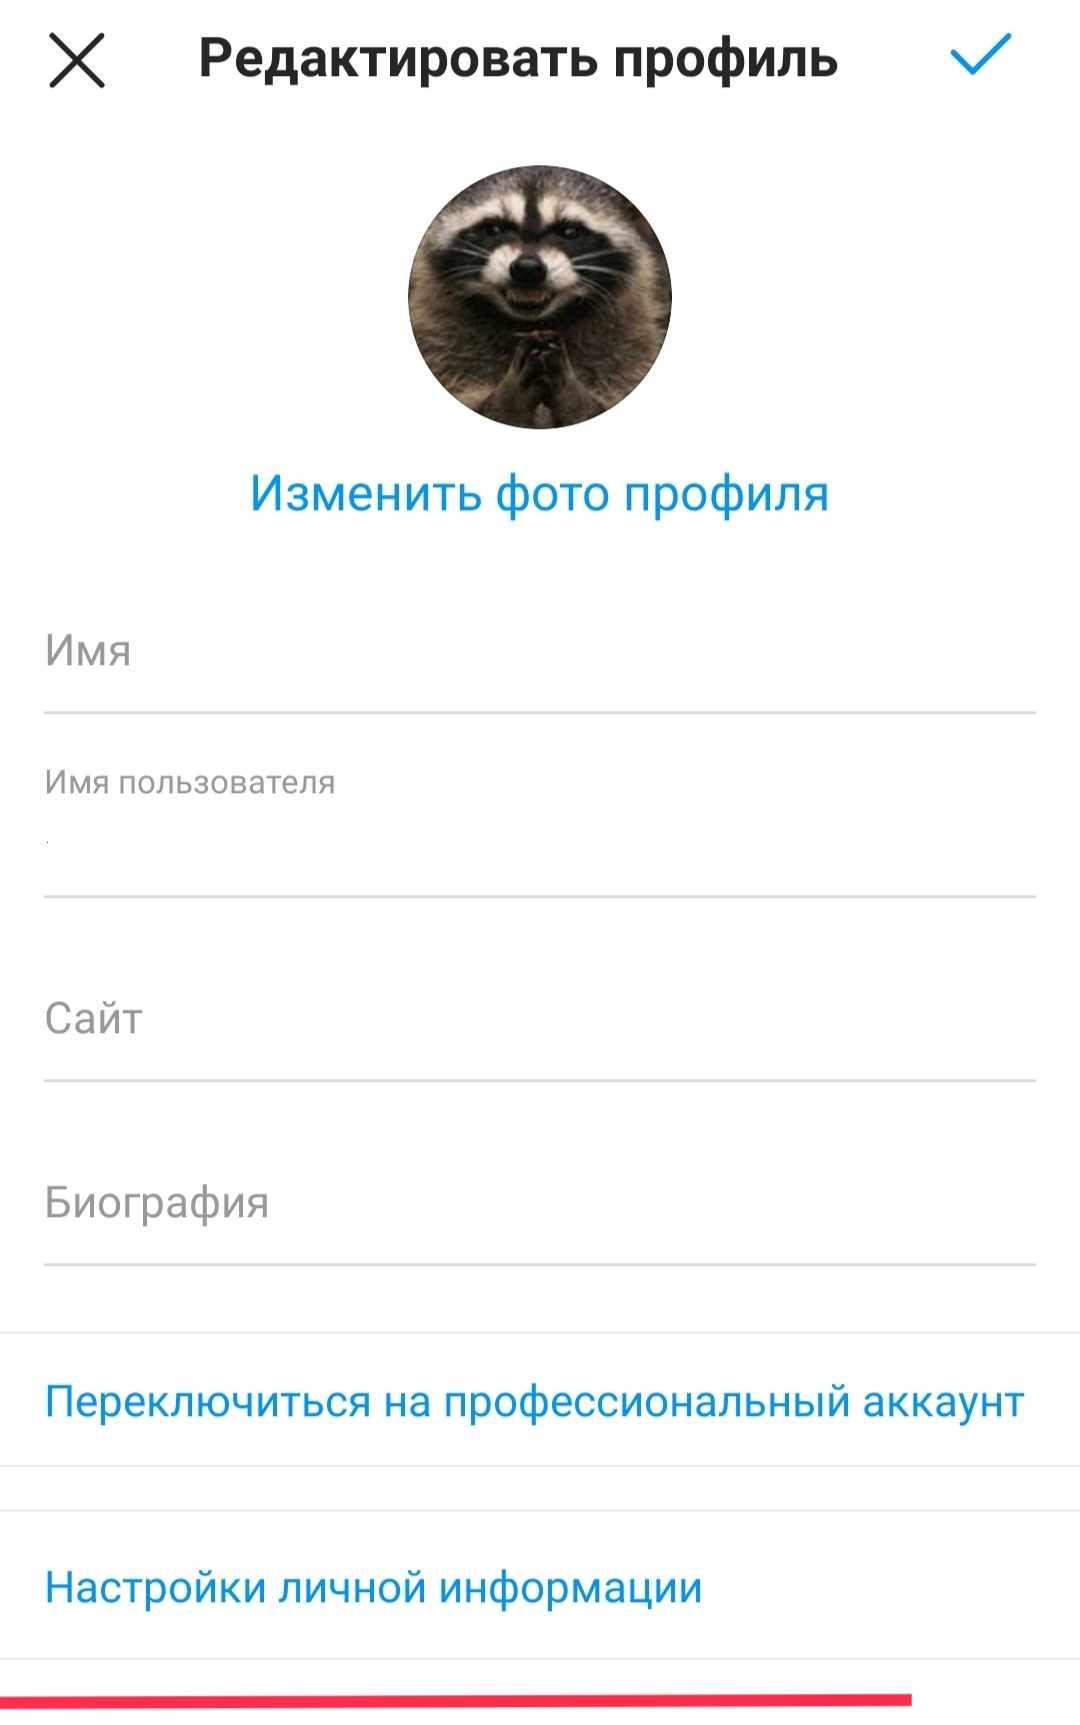 IMG_20210724_103137.jpg